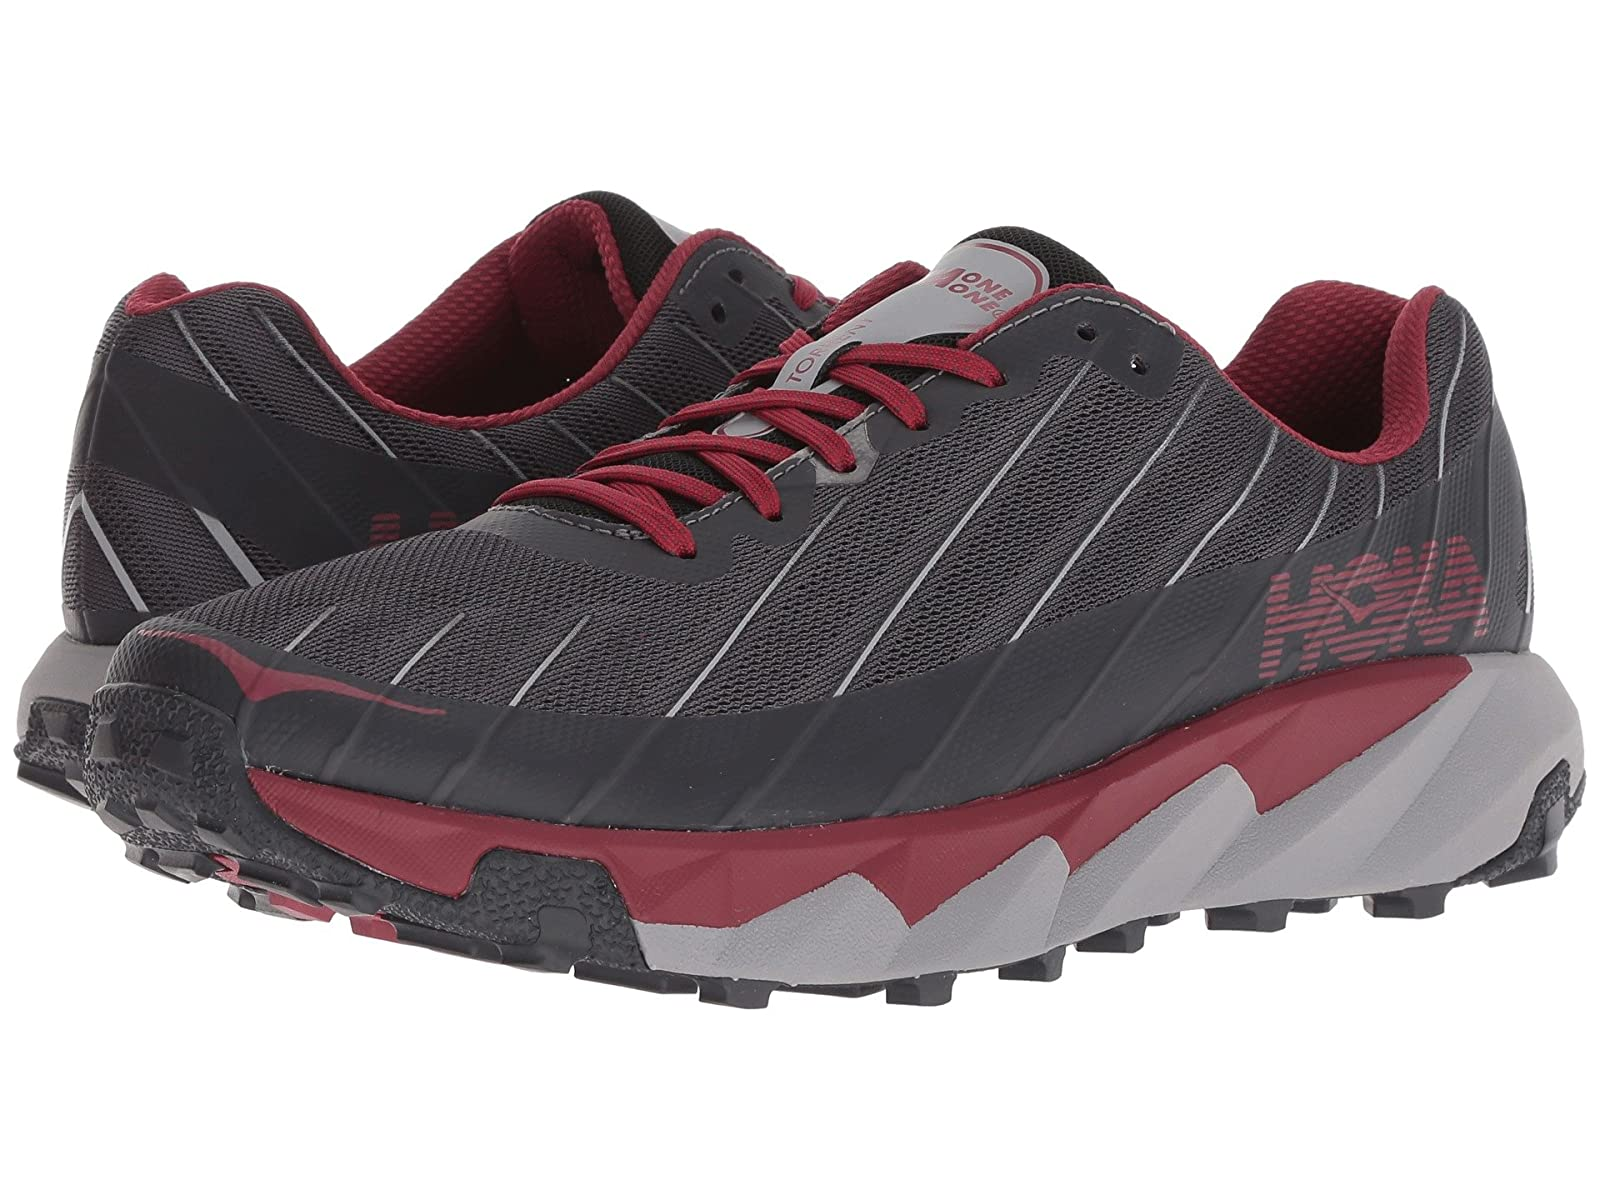 Hoka One One TorrentAtmospheric grades have affordable shoes